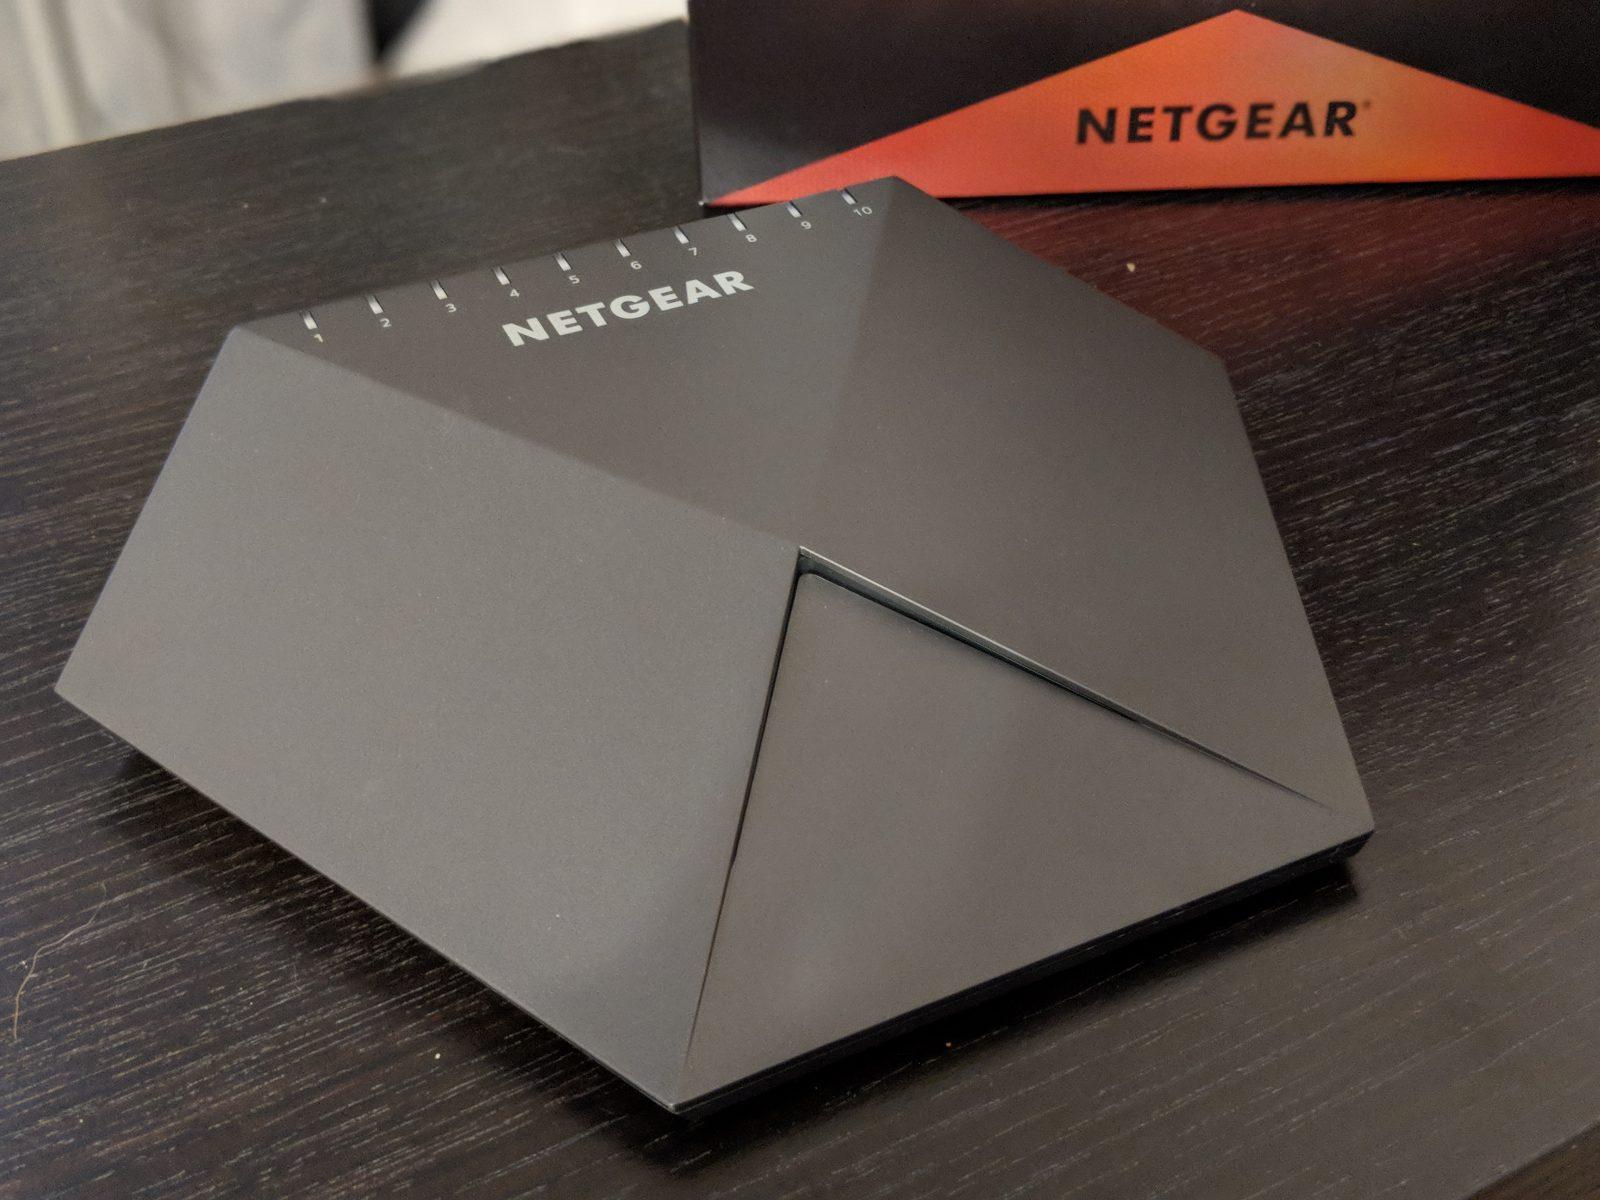 Netgear Nighthawk Pro Gaming Switch SX10 Review - 2